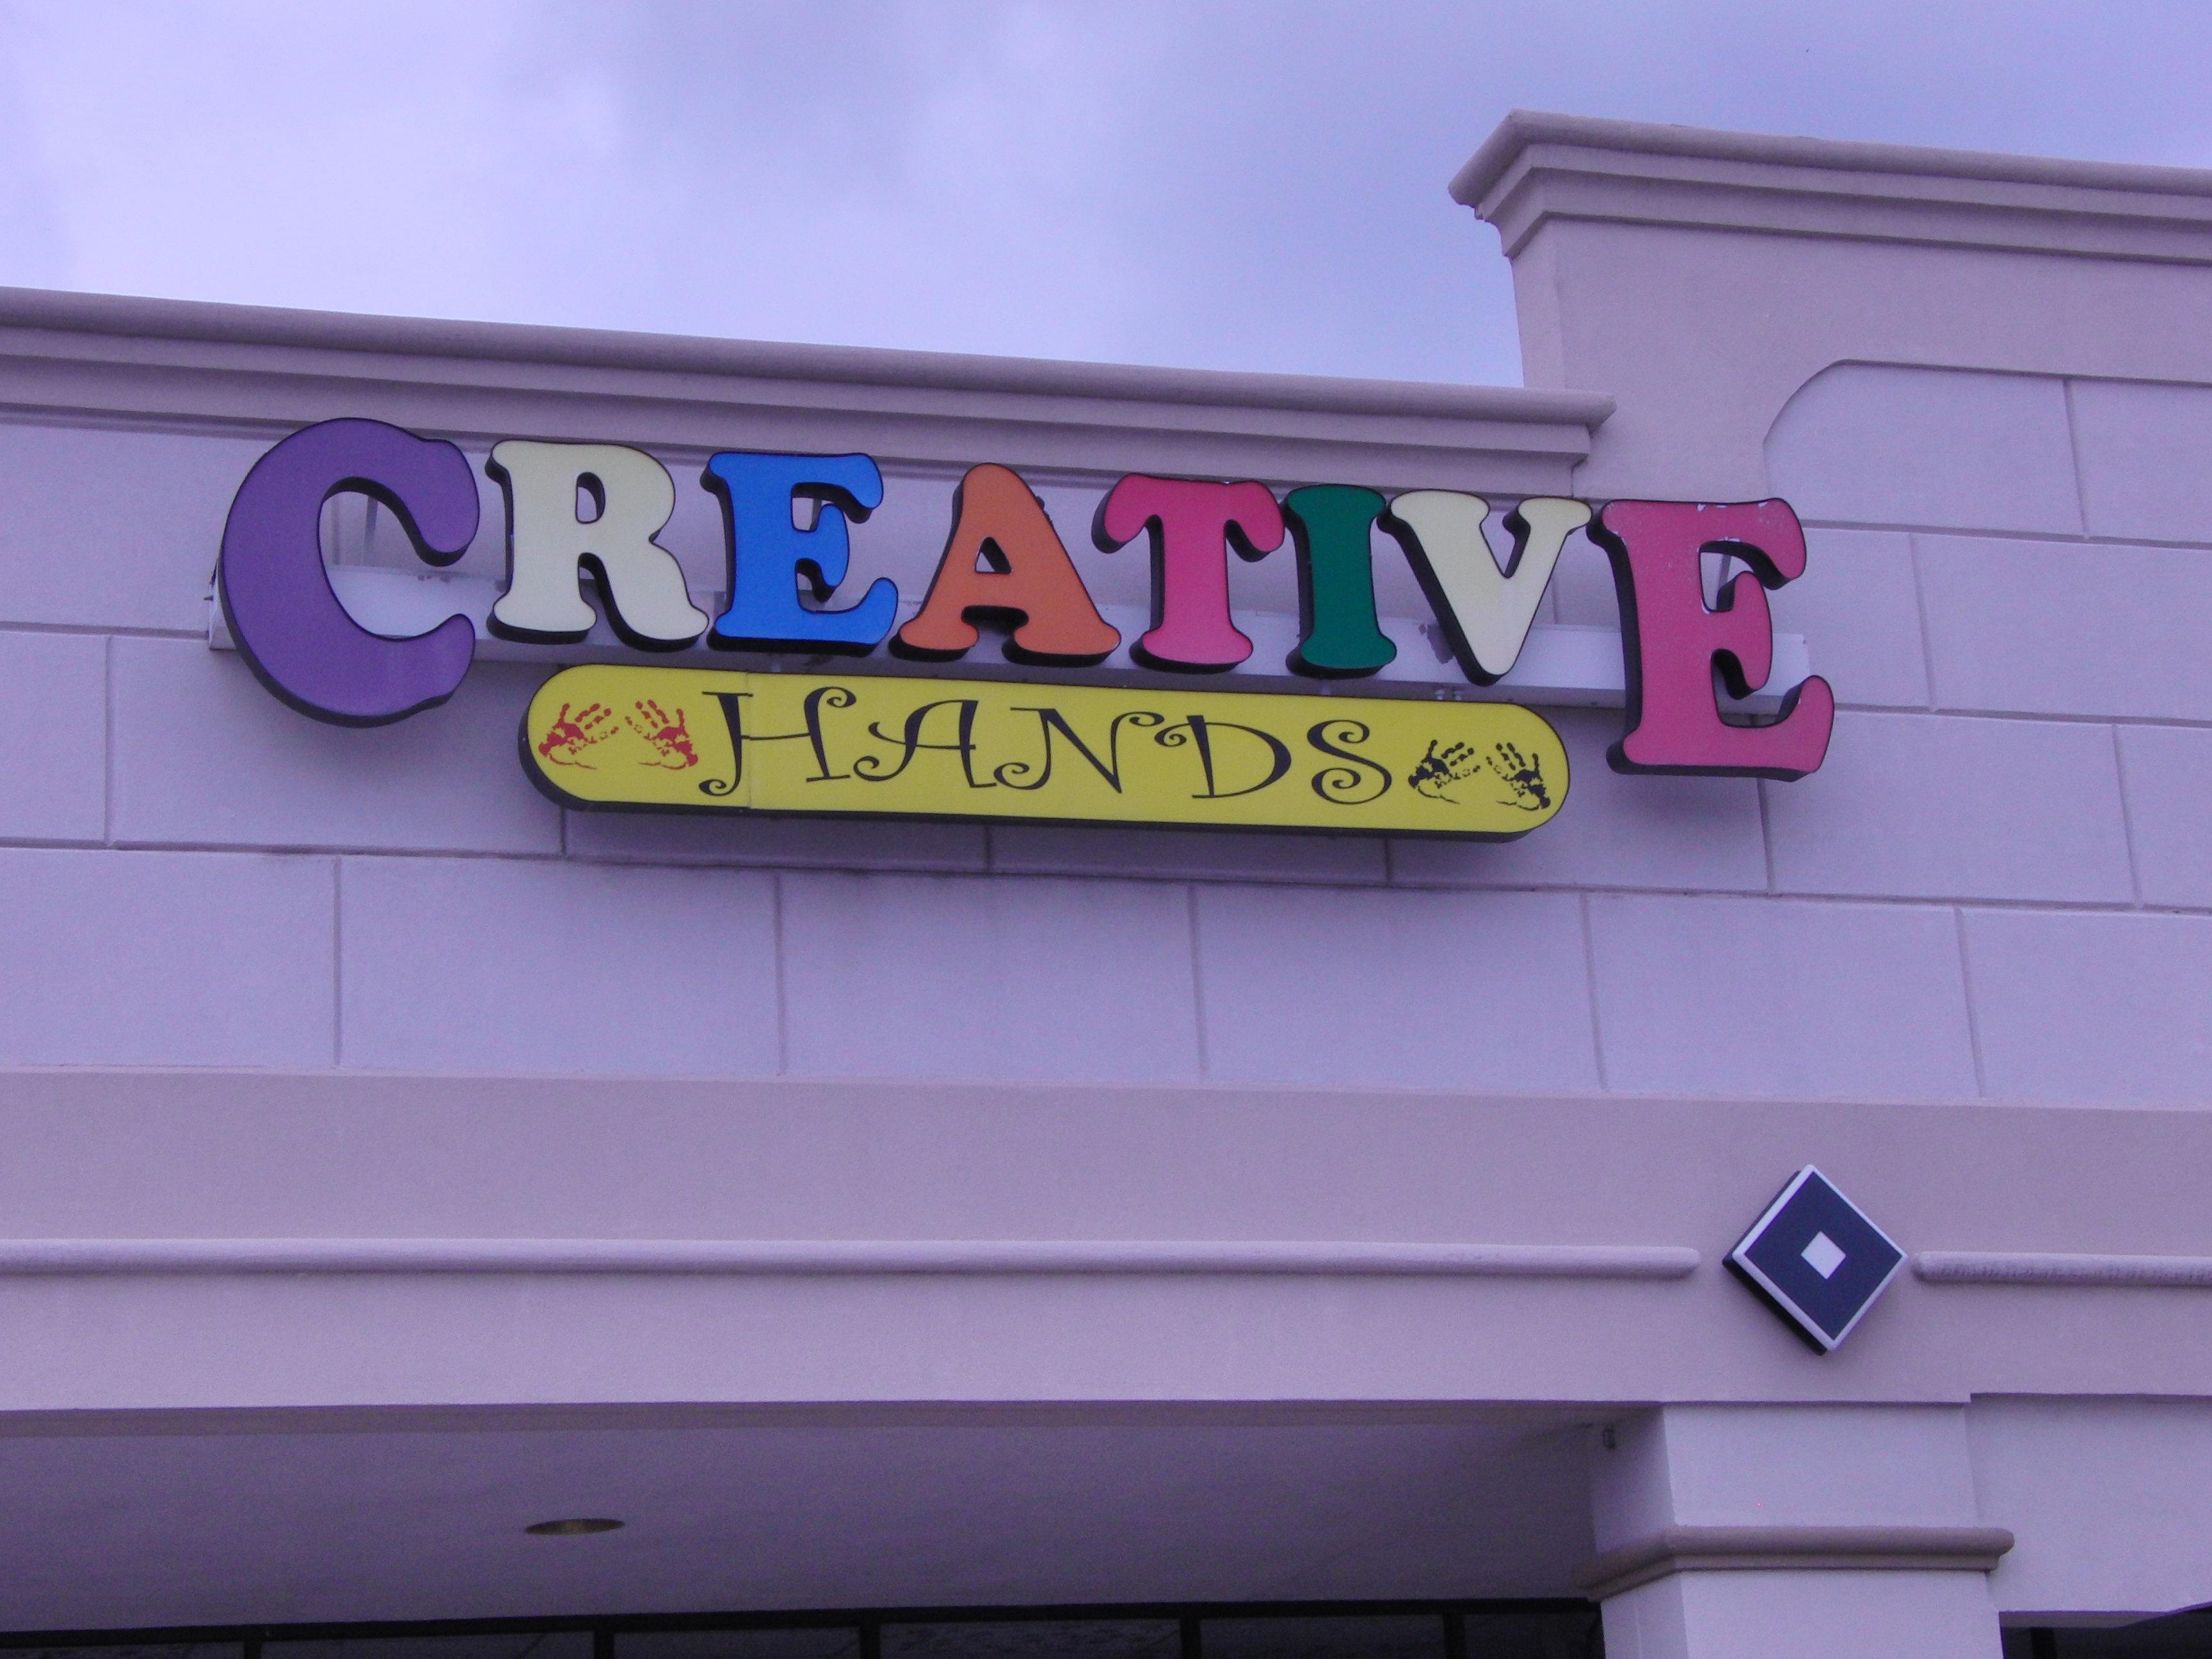 Creative hands arlington tx